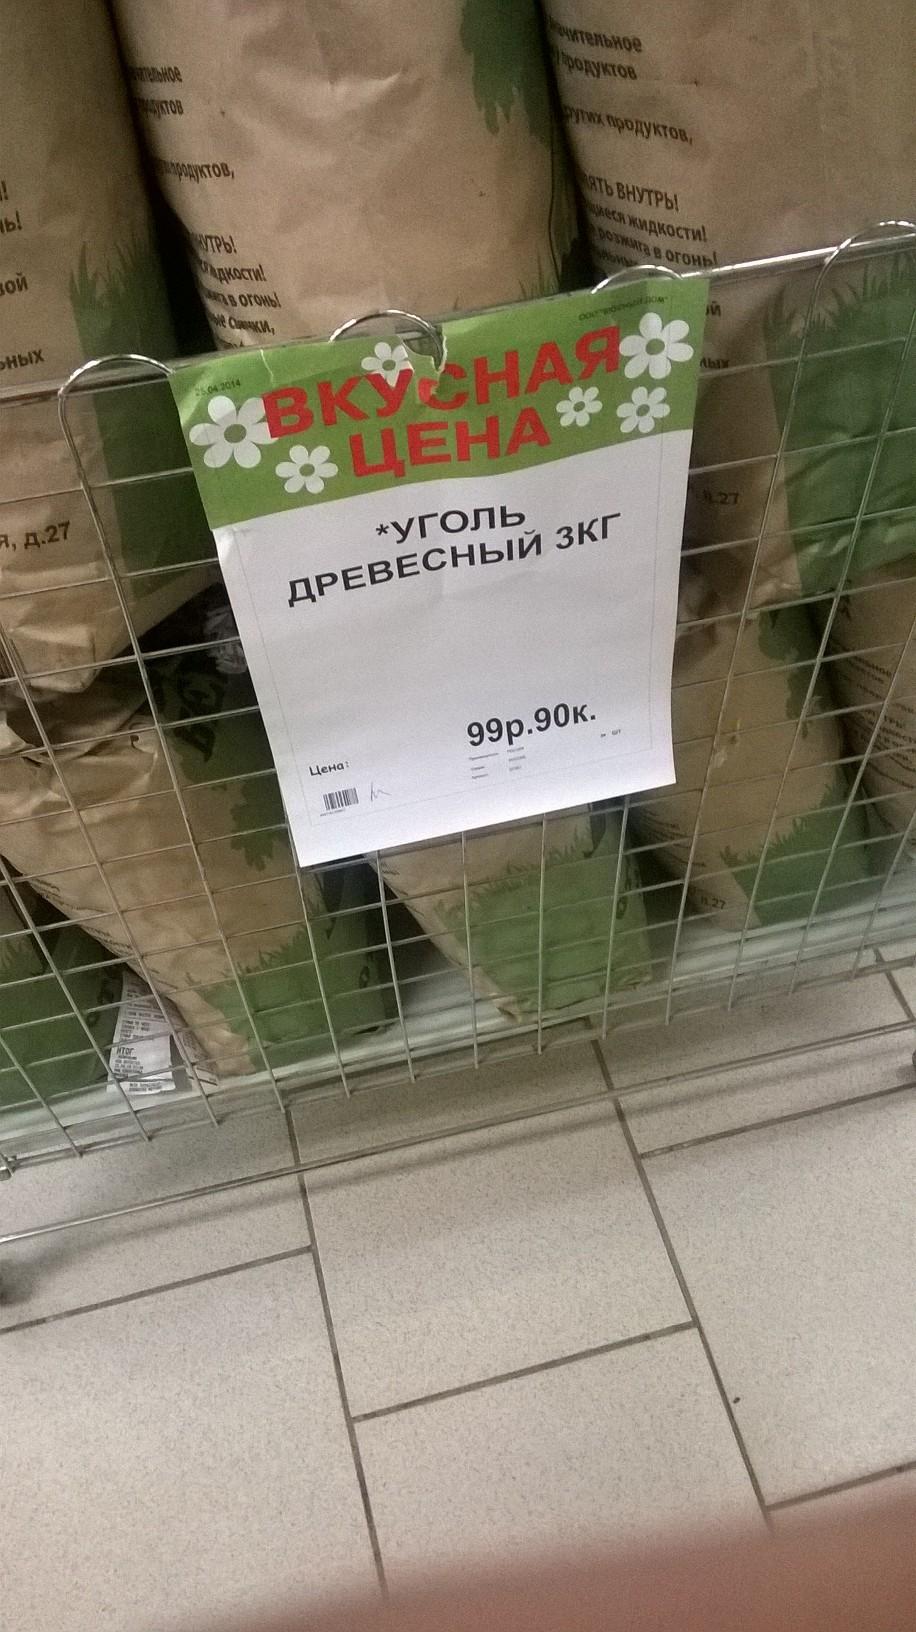 http://sa.uploads.ru/947Ps.jpg